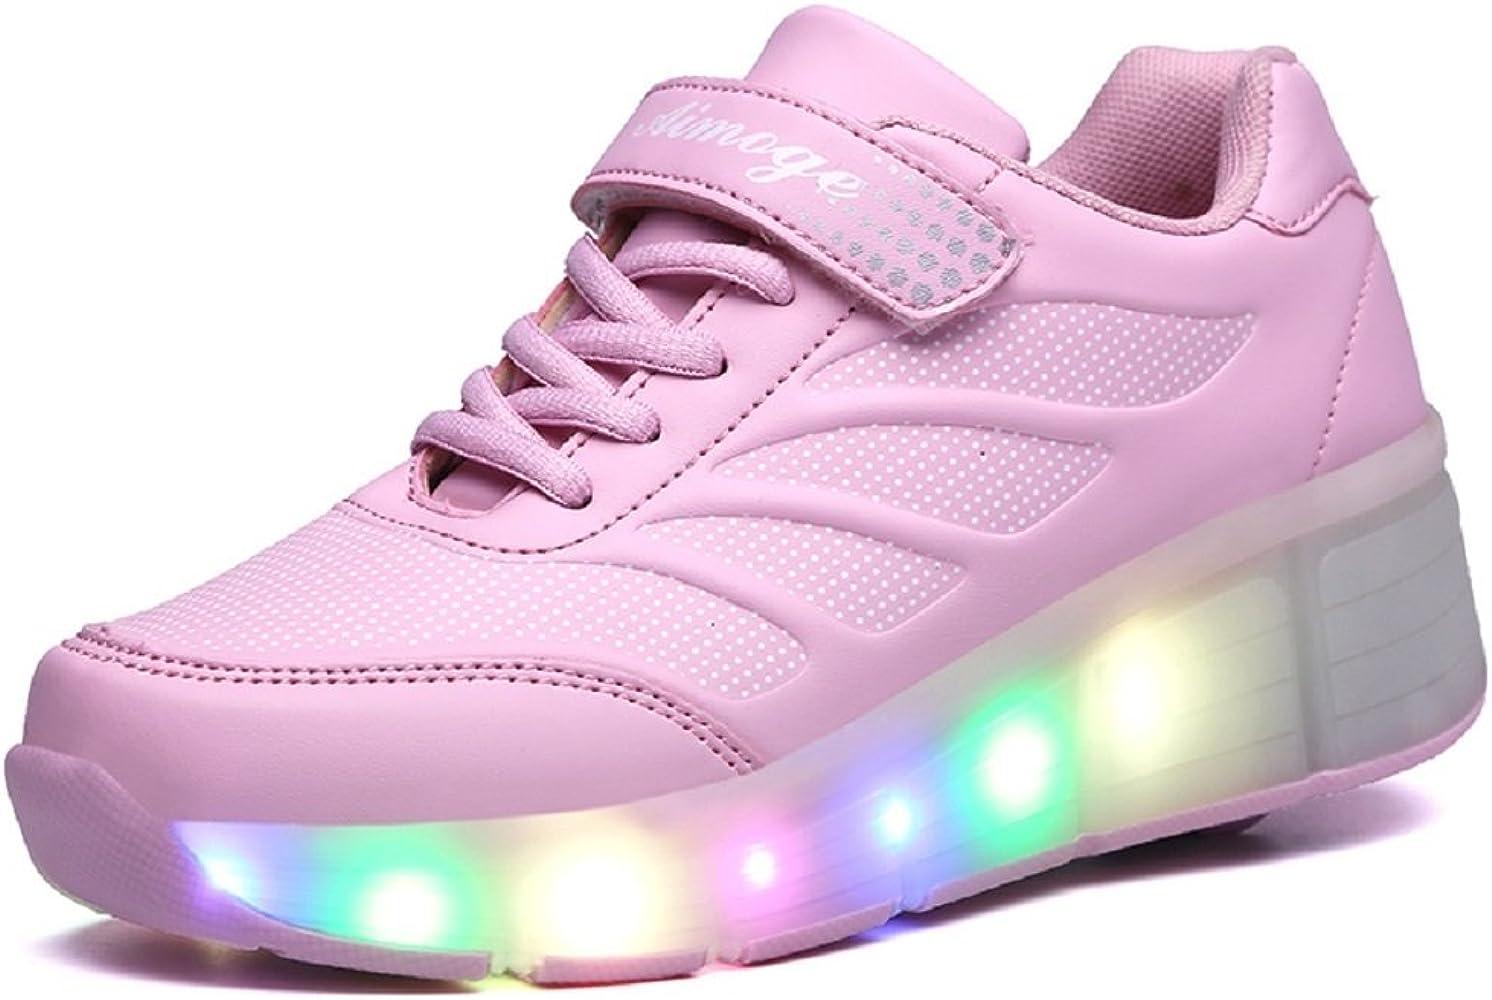 Nsasy Kids Roller Shoes Boy Girl